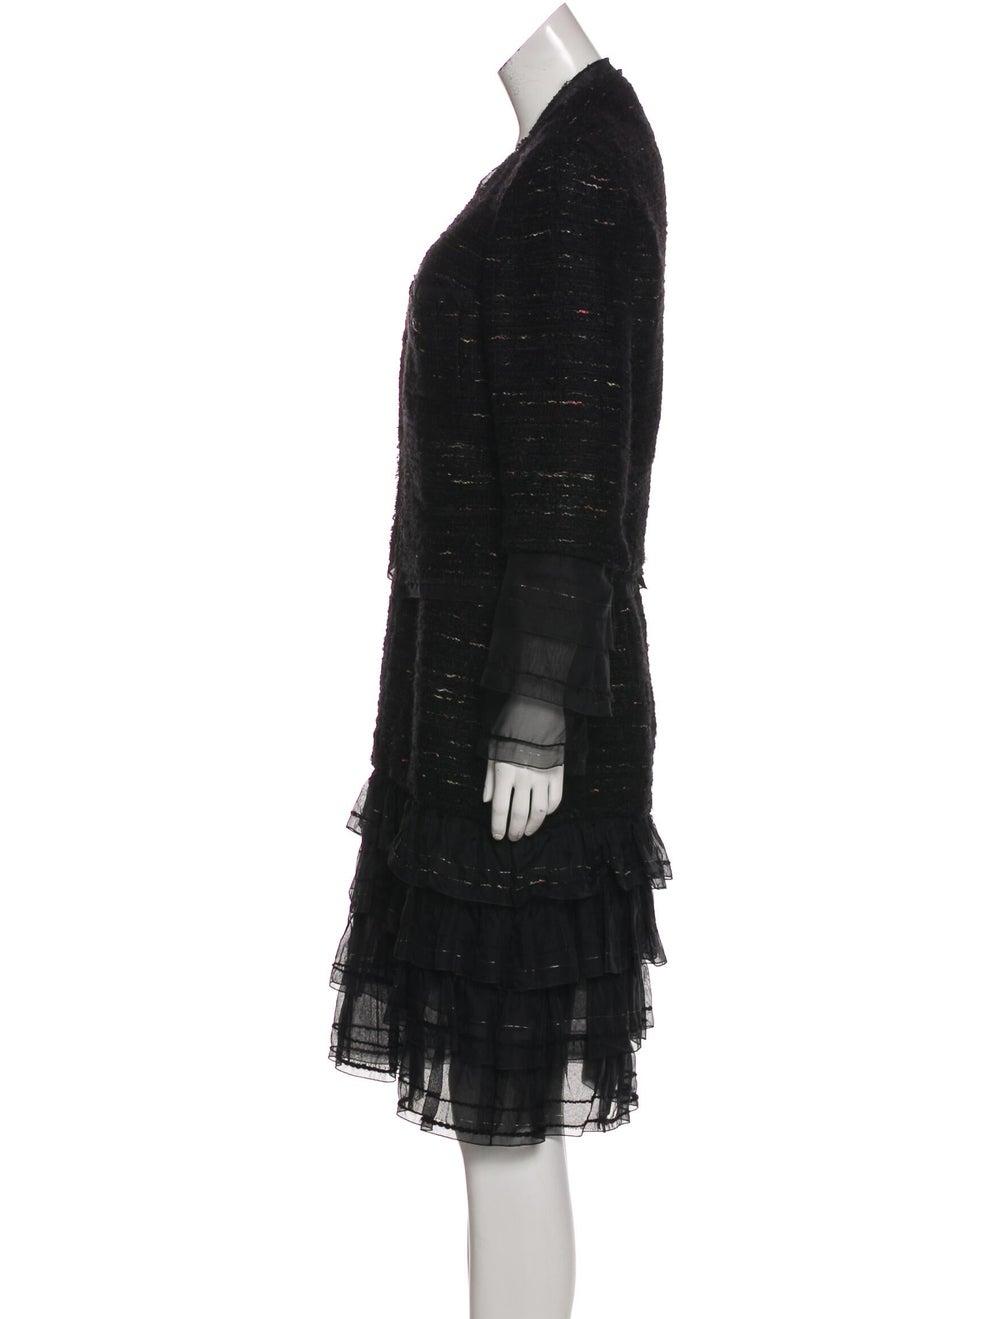 Chanel Metallic Tweed Dress Set Black - image 2